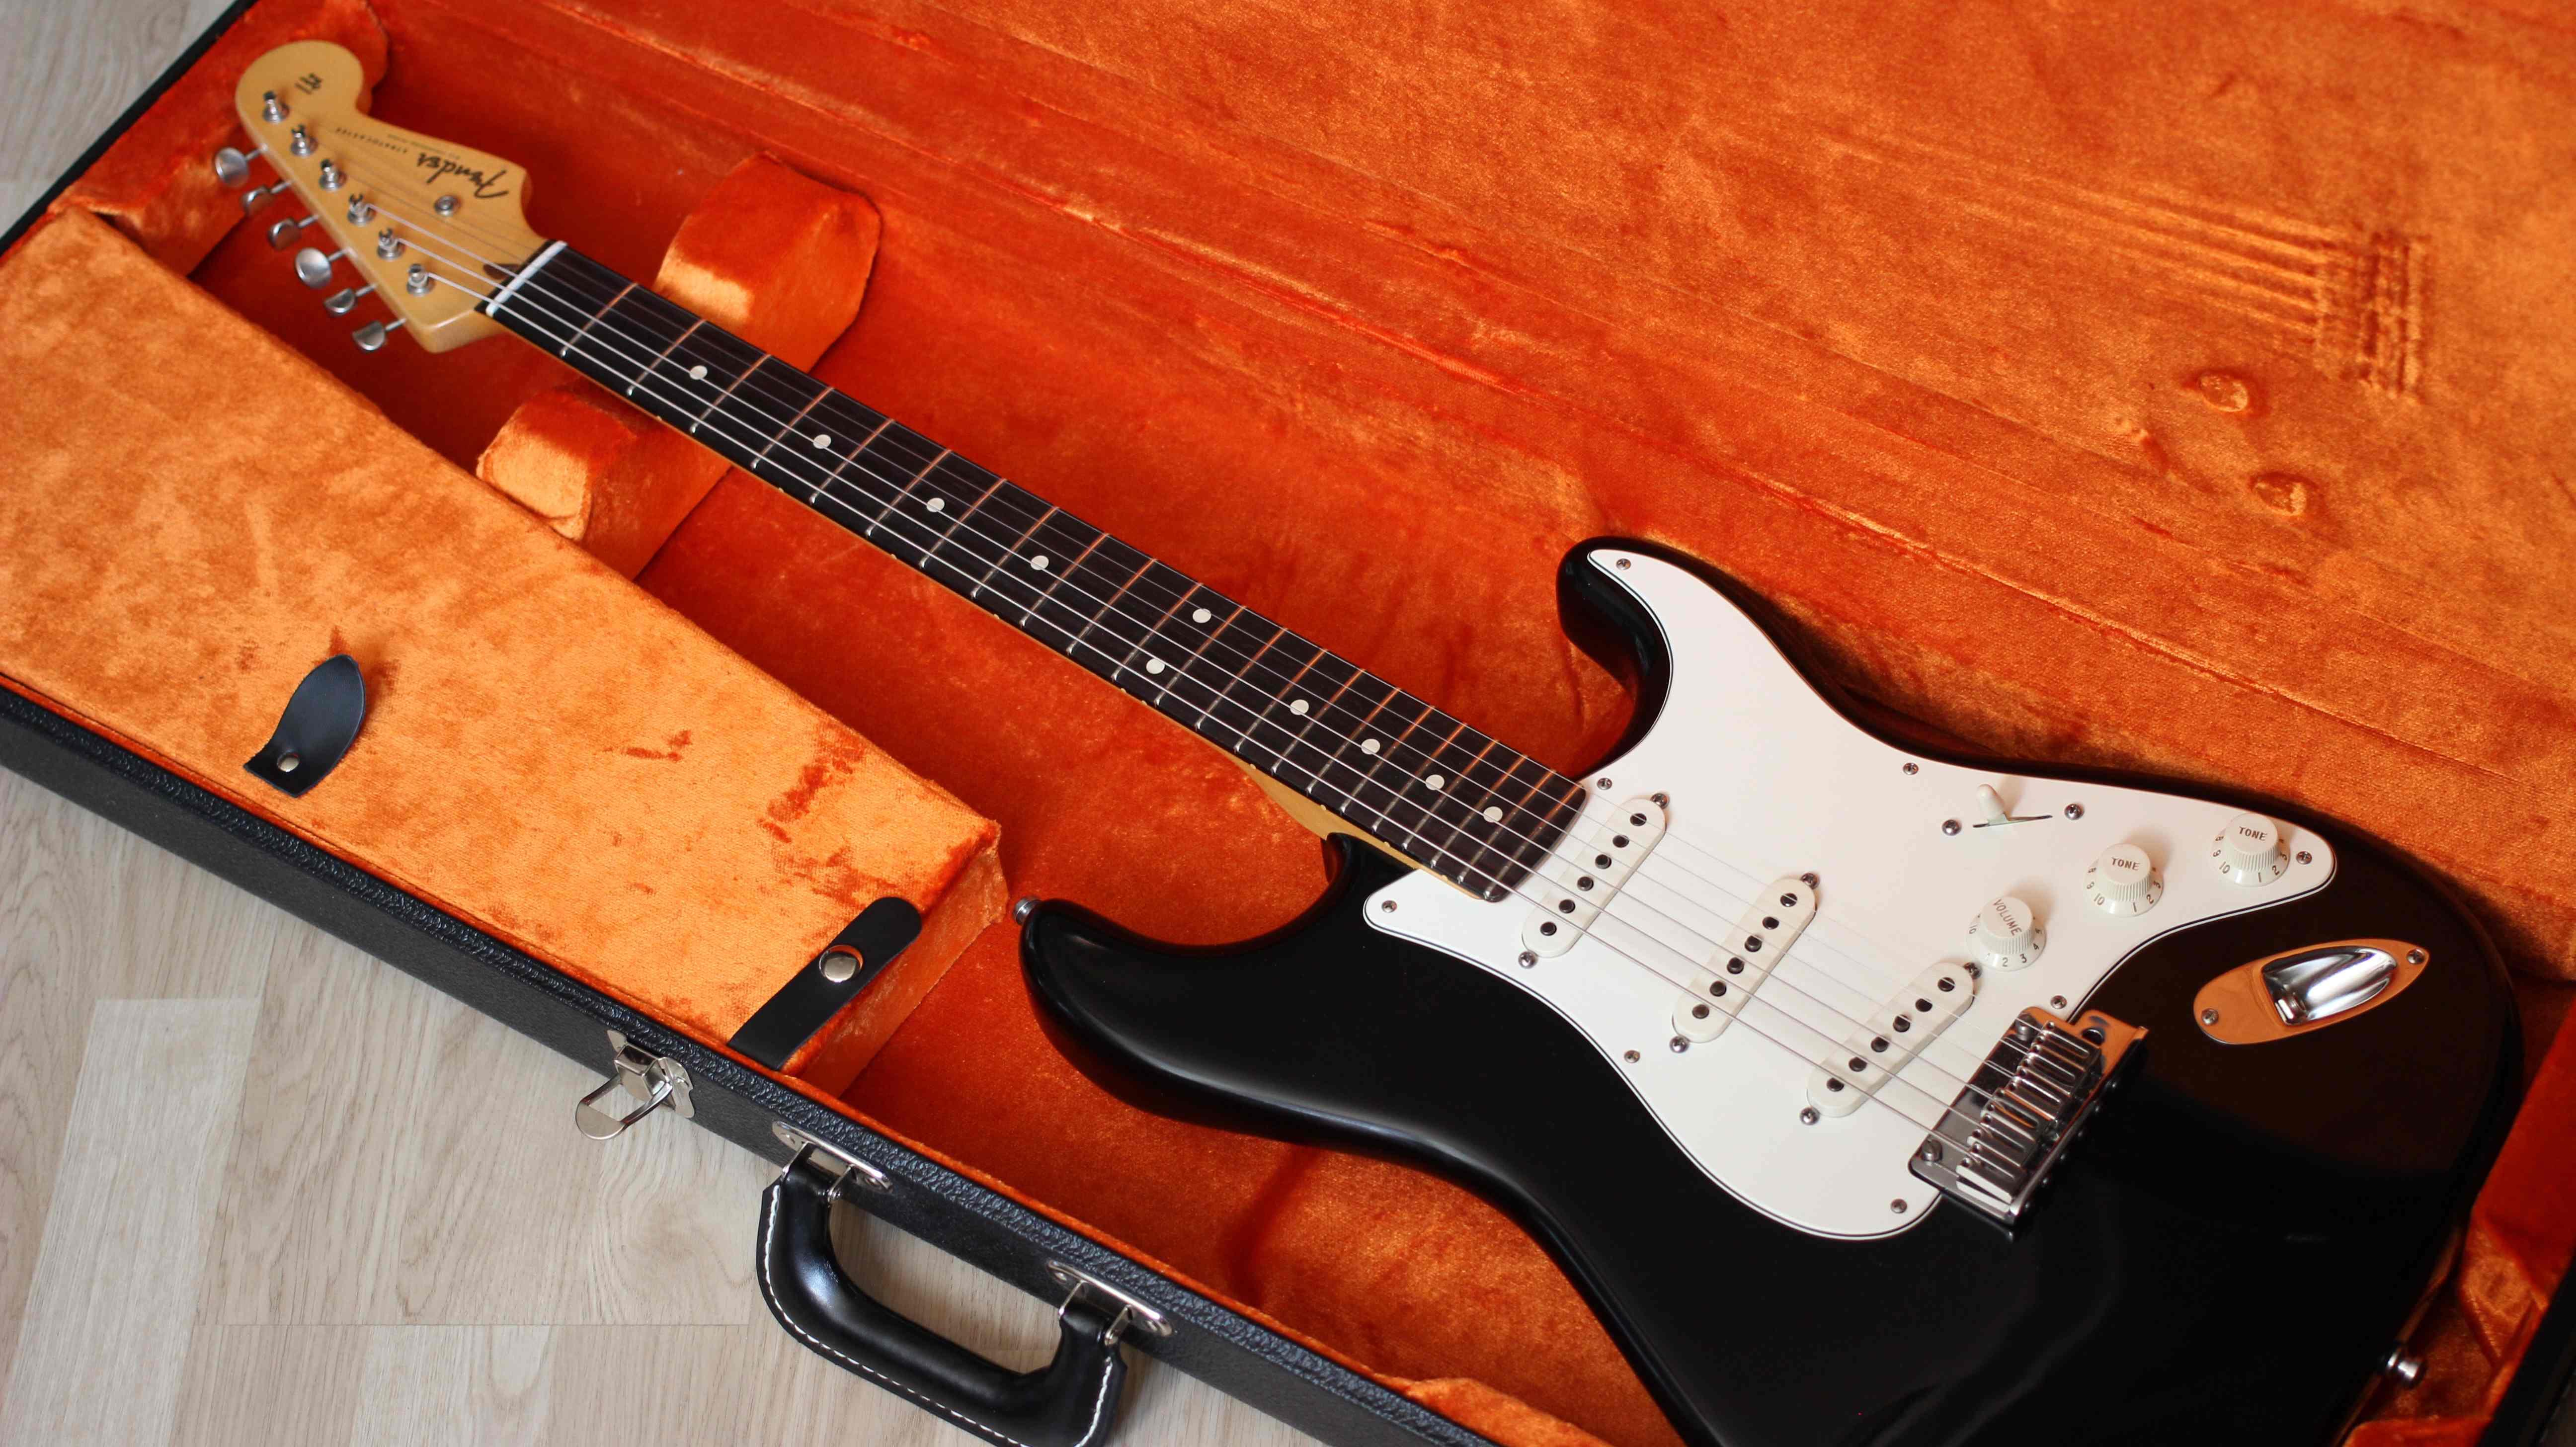 Fender Custom Shop 2012 Closet Classic Stratocaster Pro Eddymusic Images